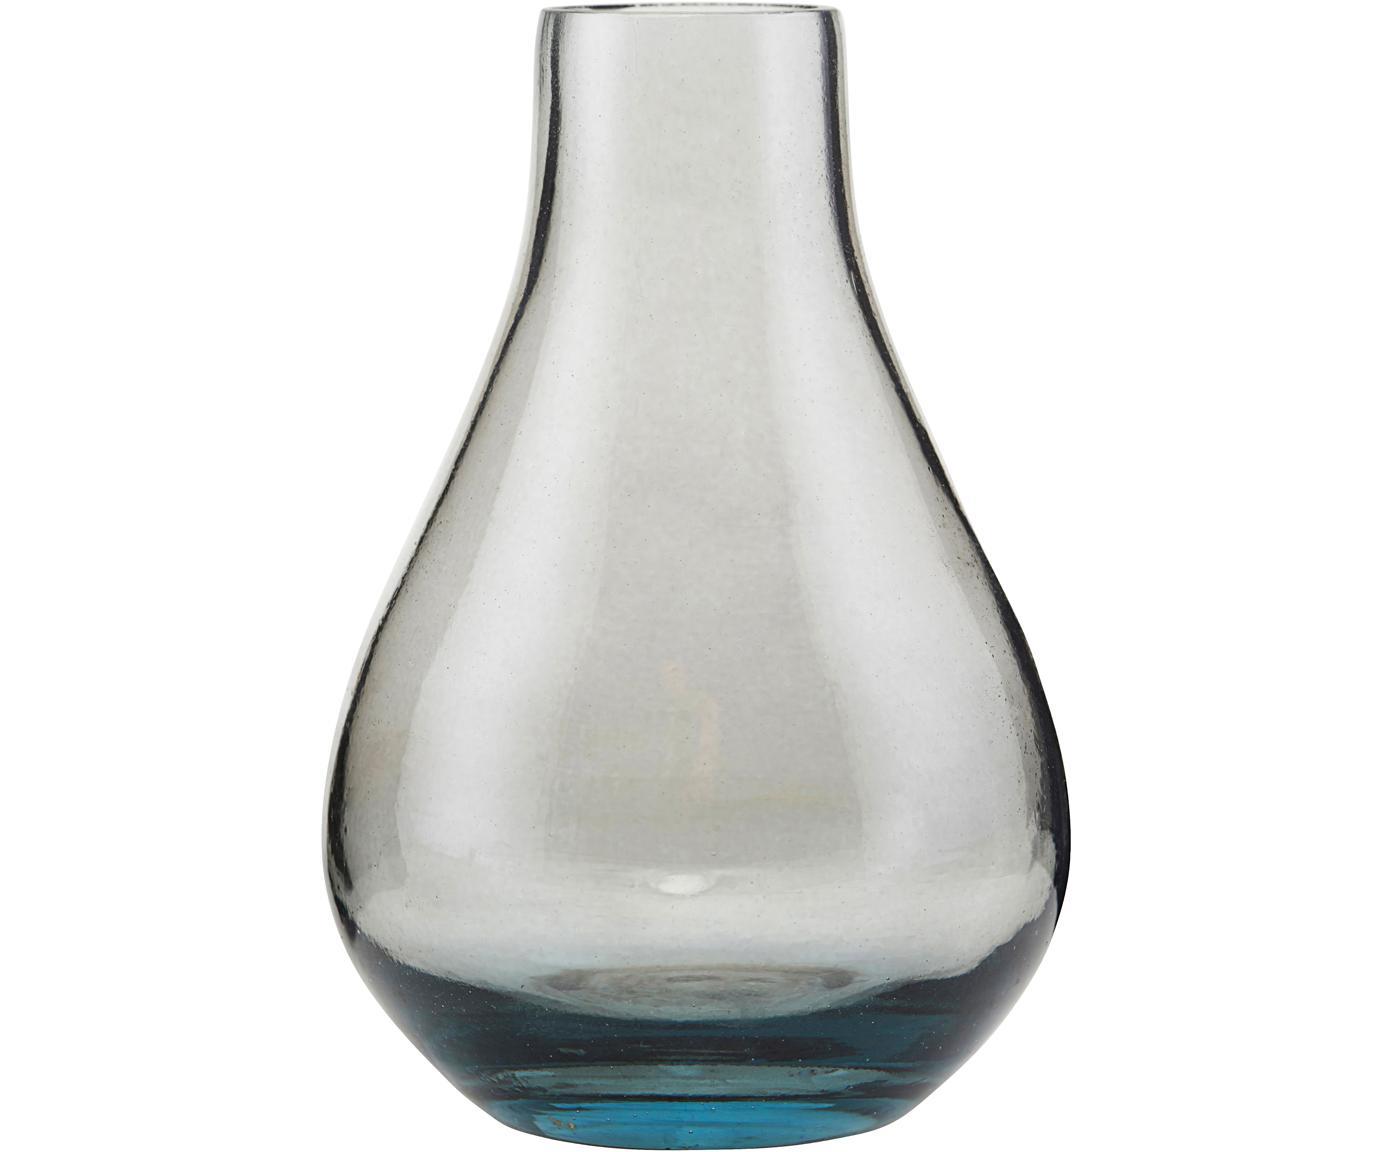 Glas-Vase Sandra, Glas, Grau, transparent, Ø 7 x H 11 cm